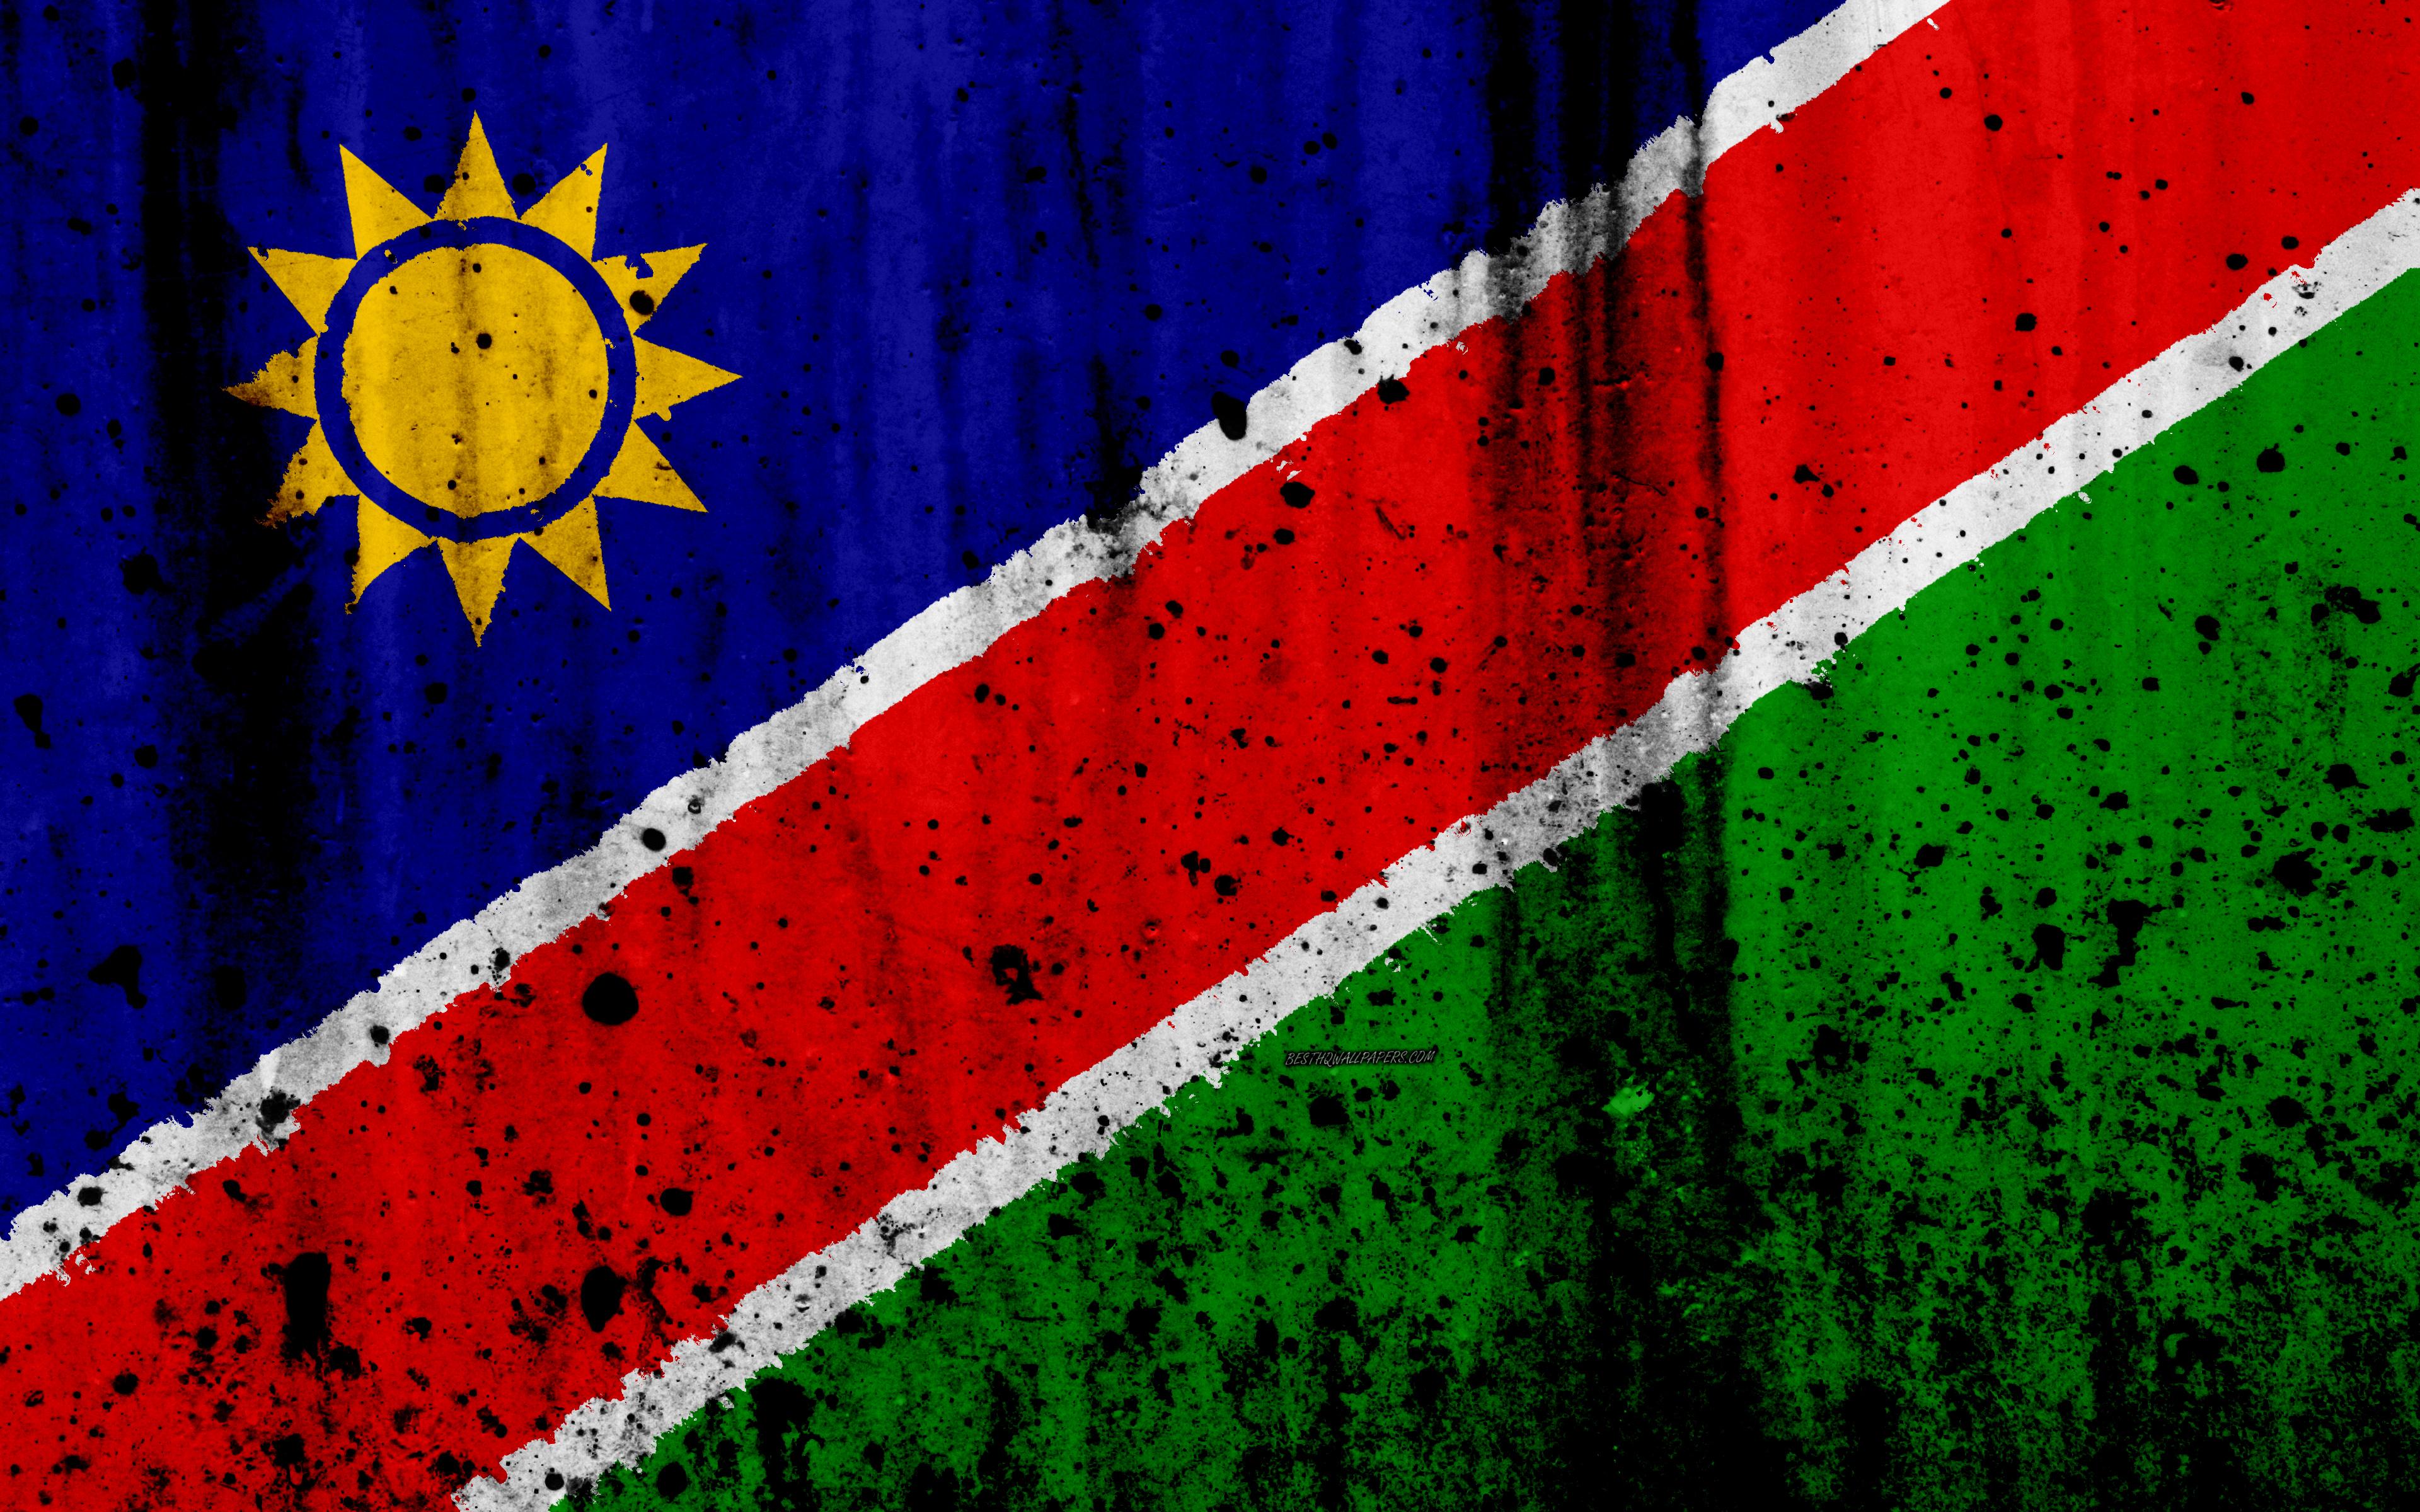 Download wallpapers Namibian flag 4k grunge flag of Namibia 3840x2400